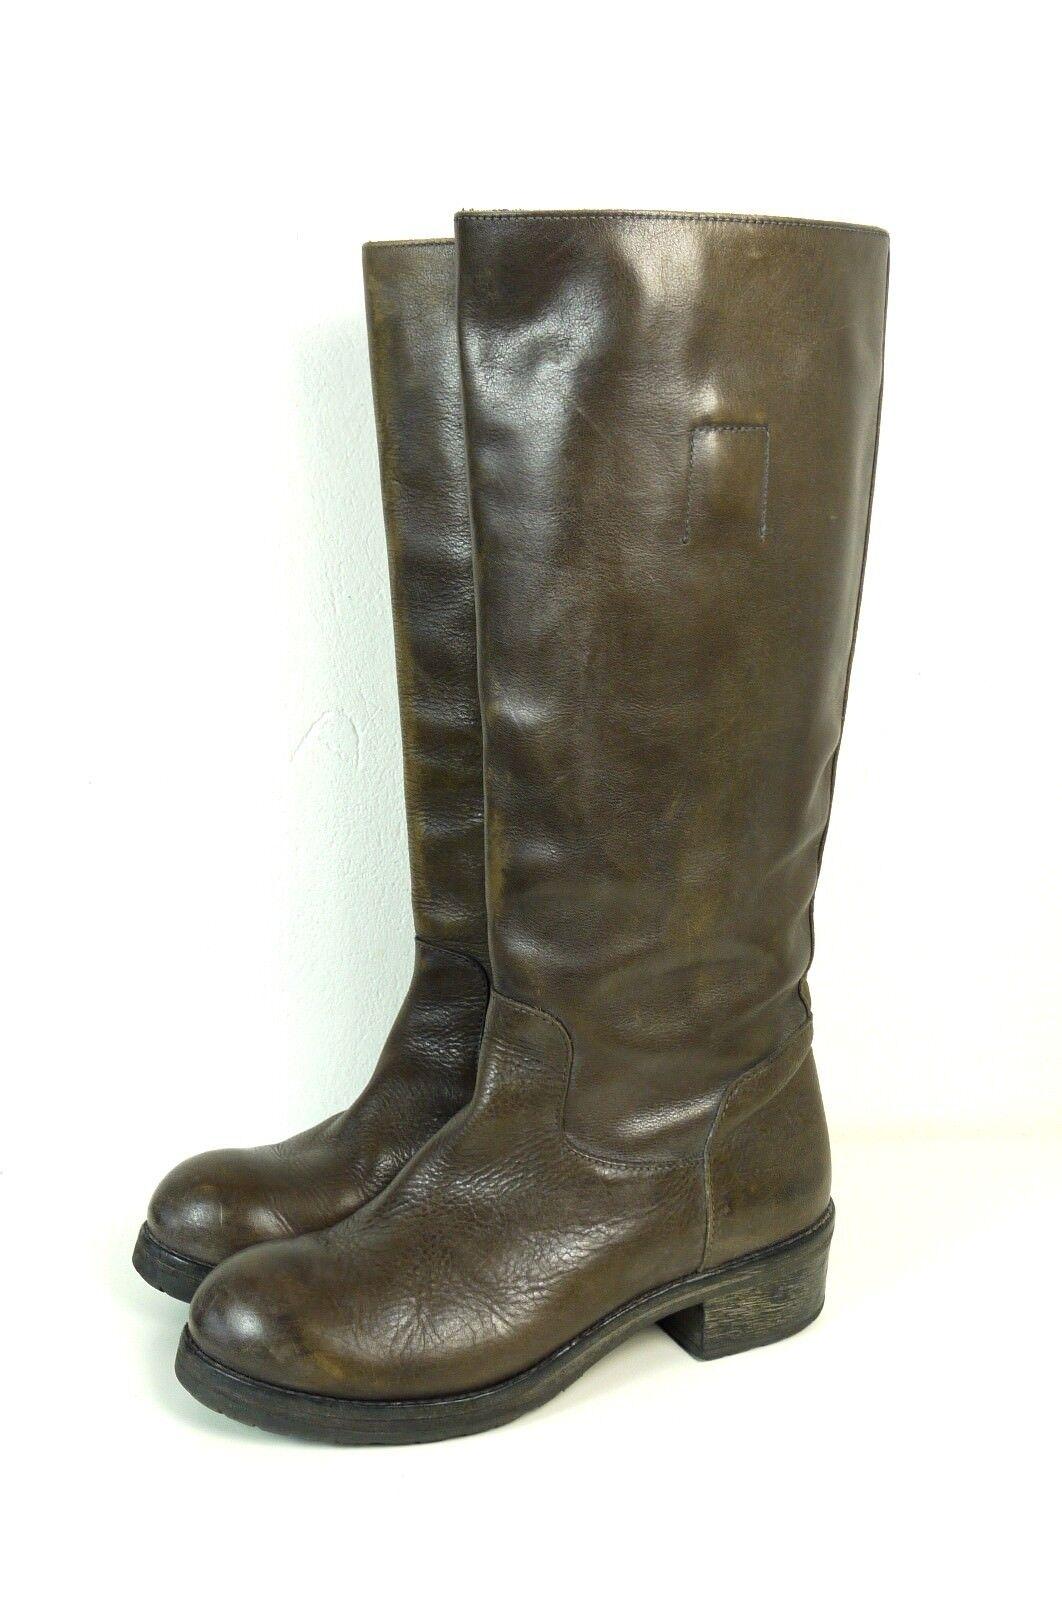 Moma botas motorista Echt Leder marrón talla (t110)